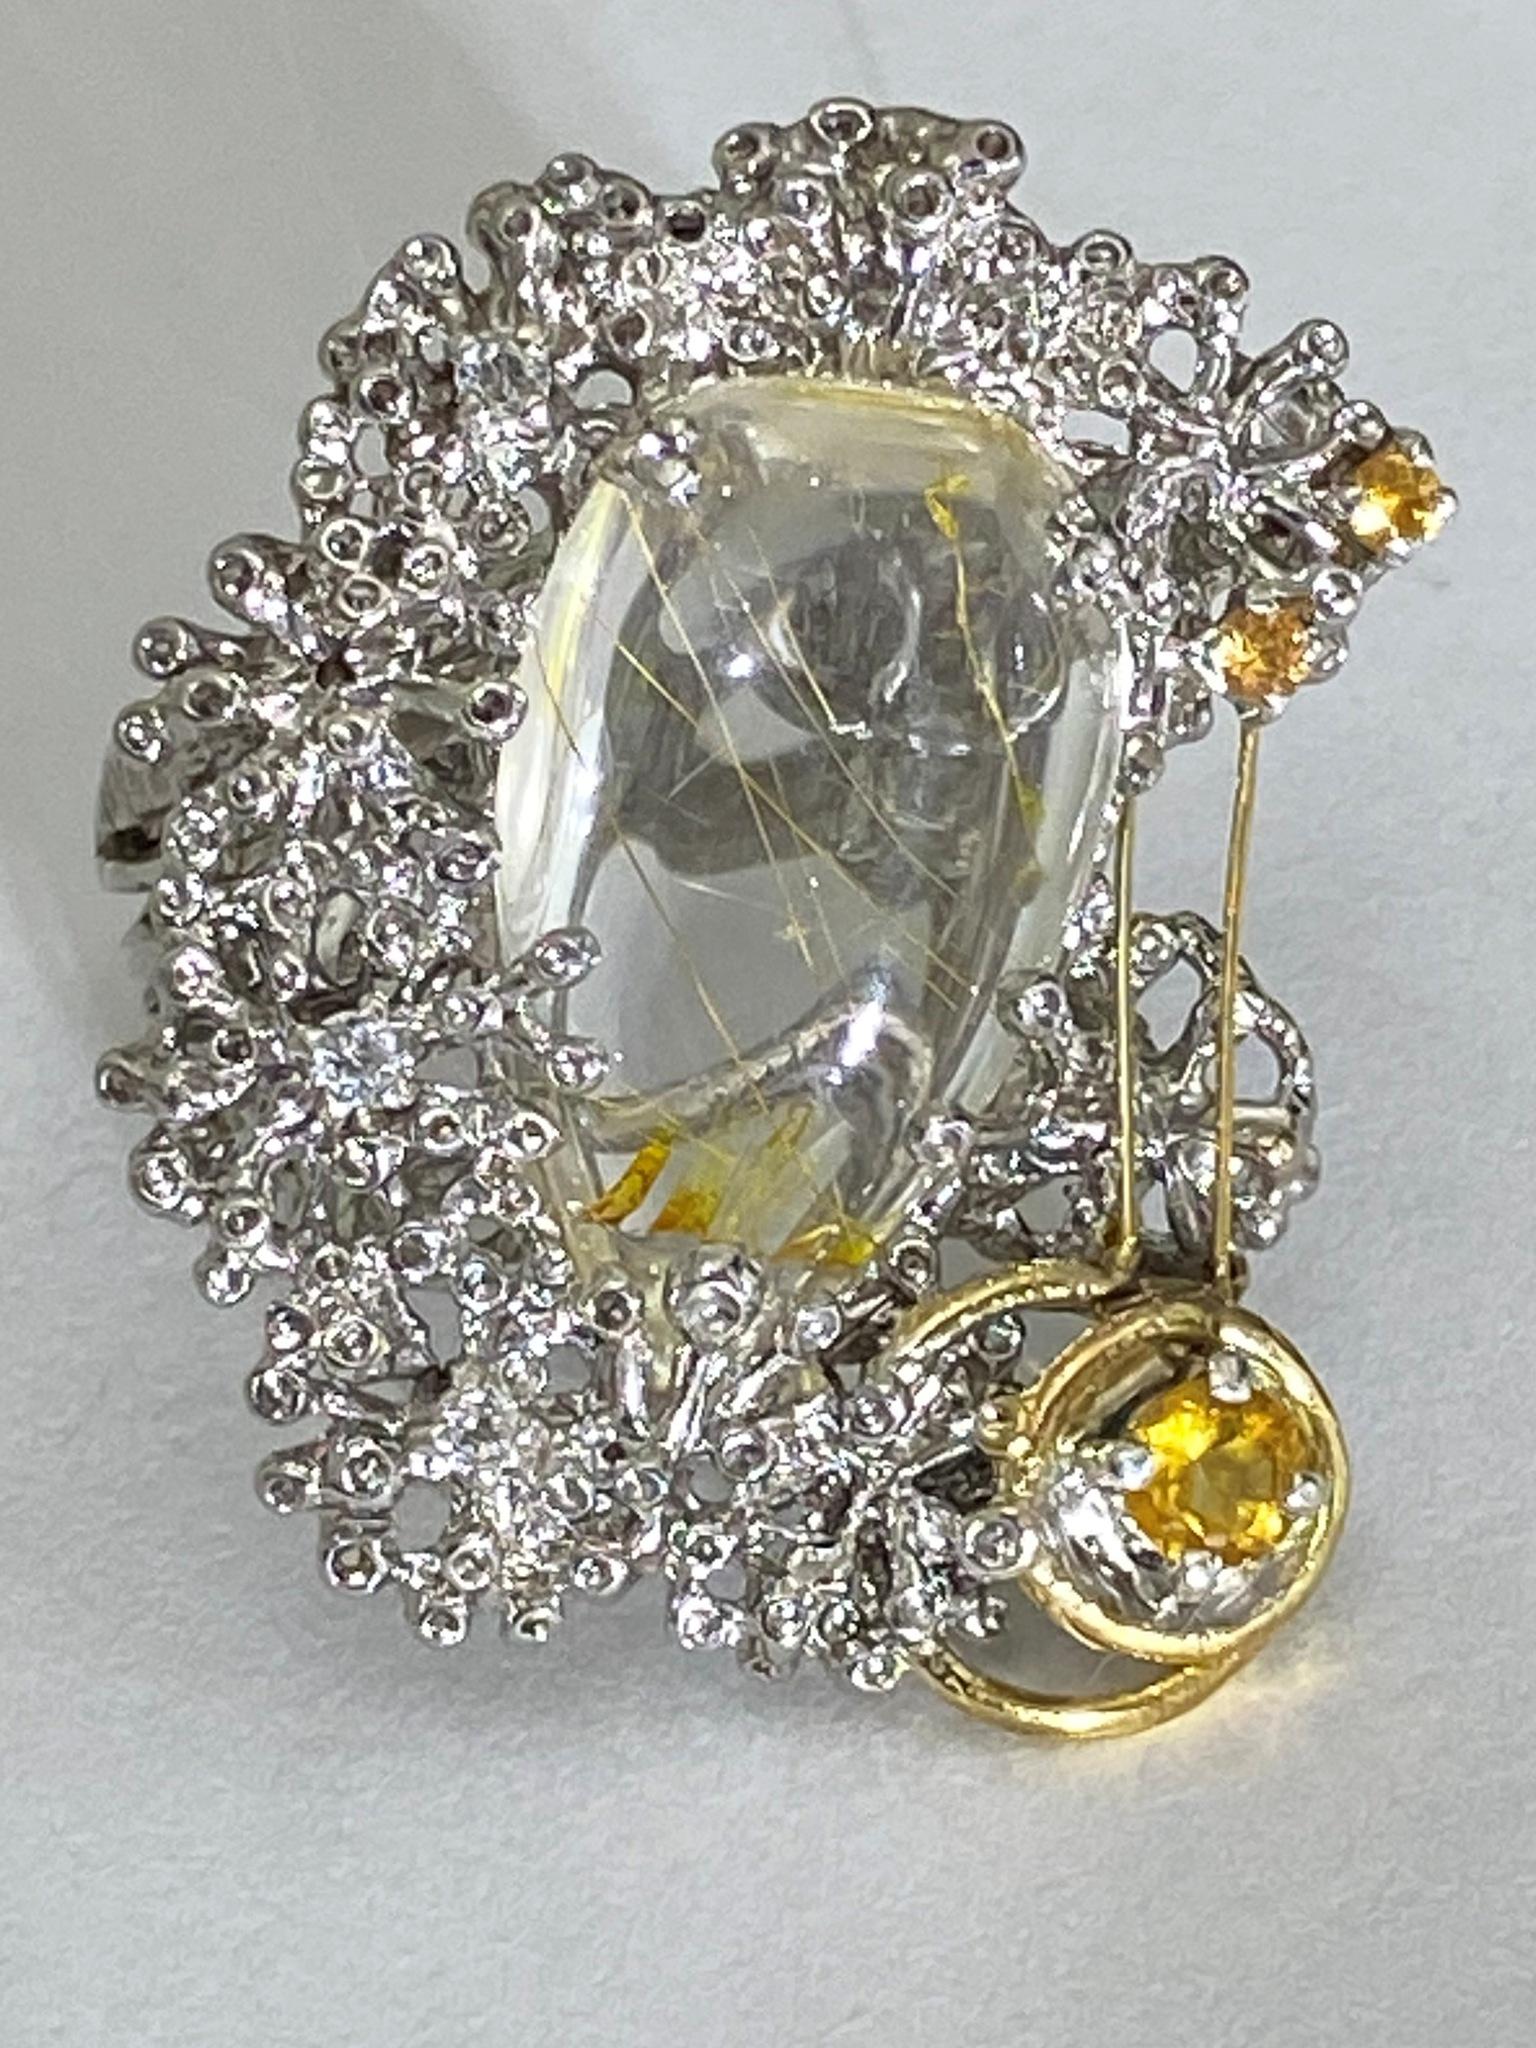 Волосатик (кольцо из серебра)